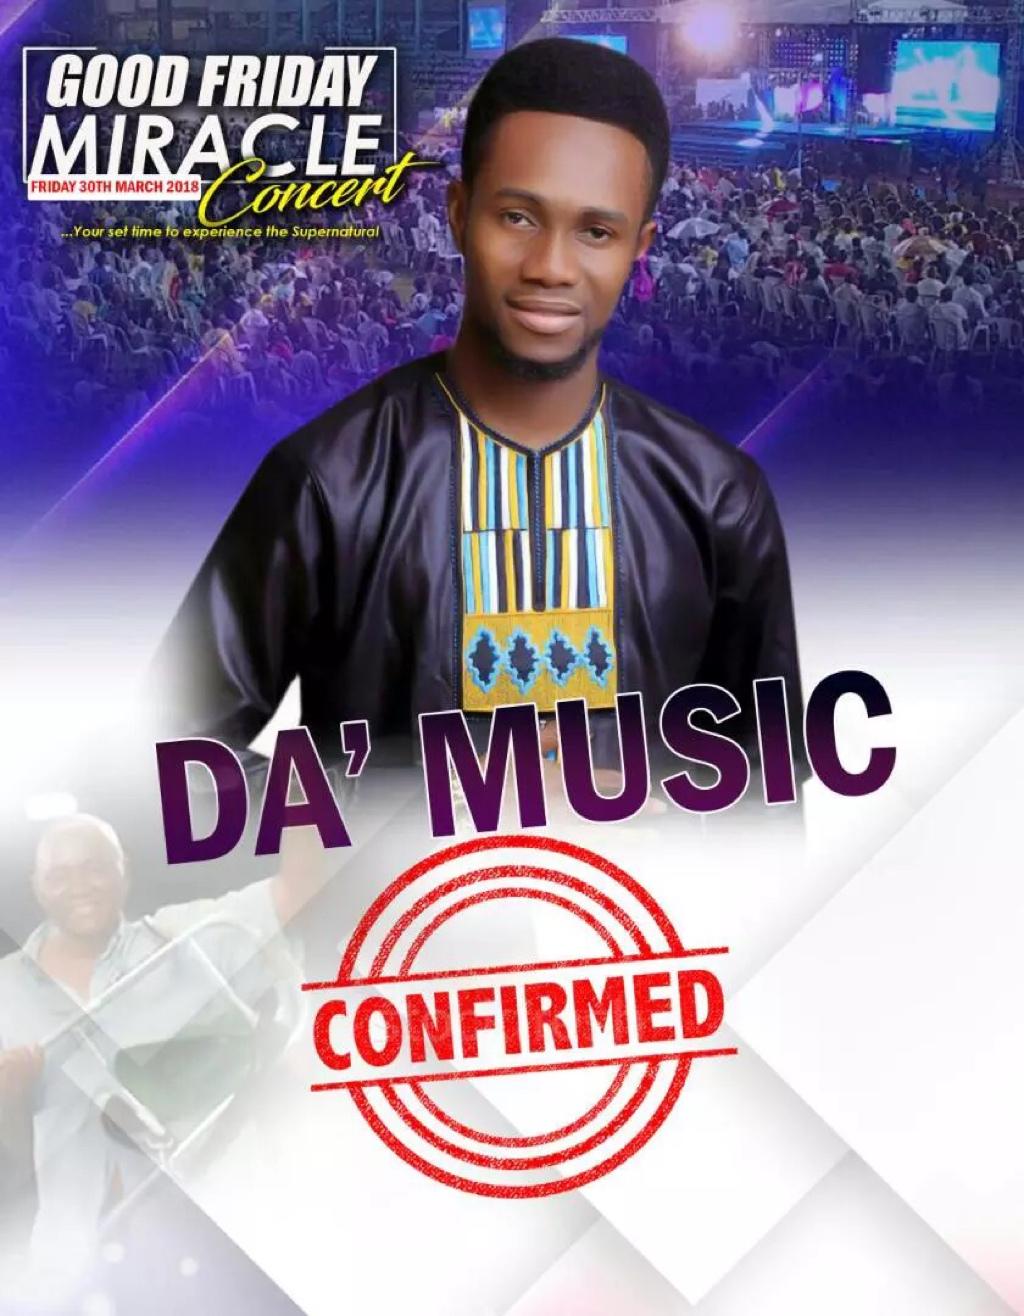 Ministering Da Music #GFMC2018 #CRVZ